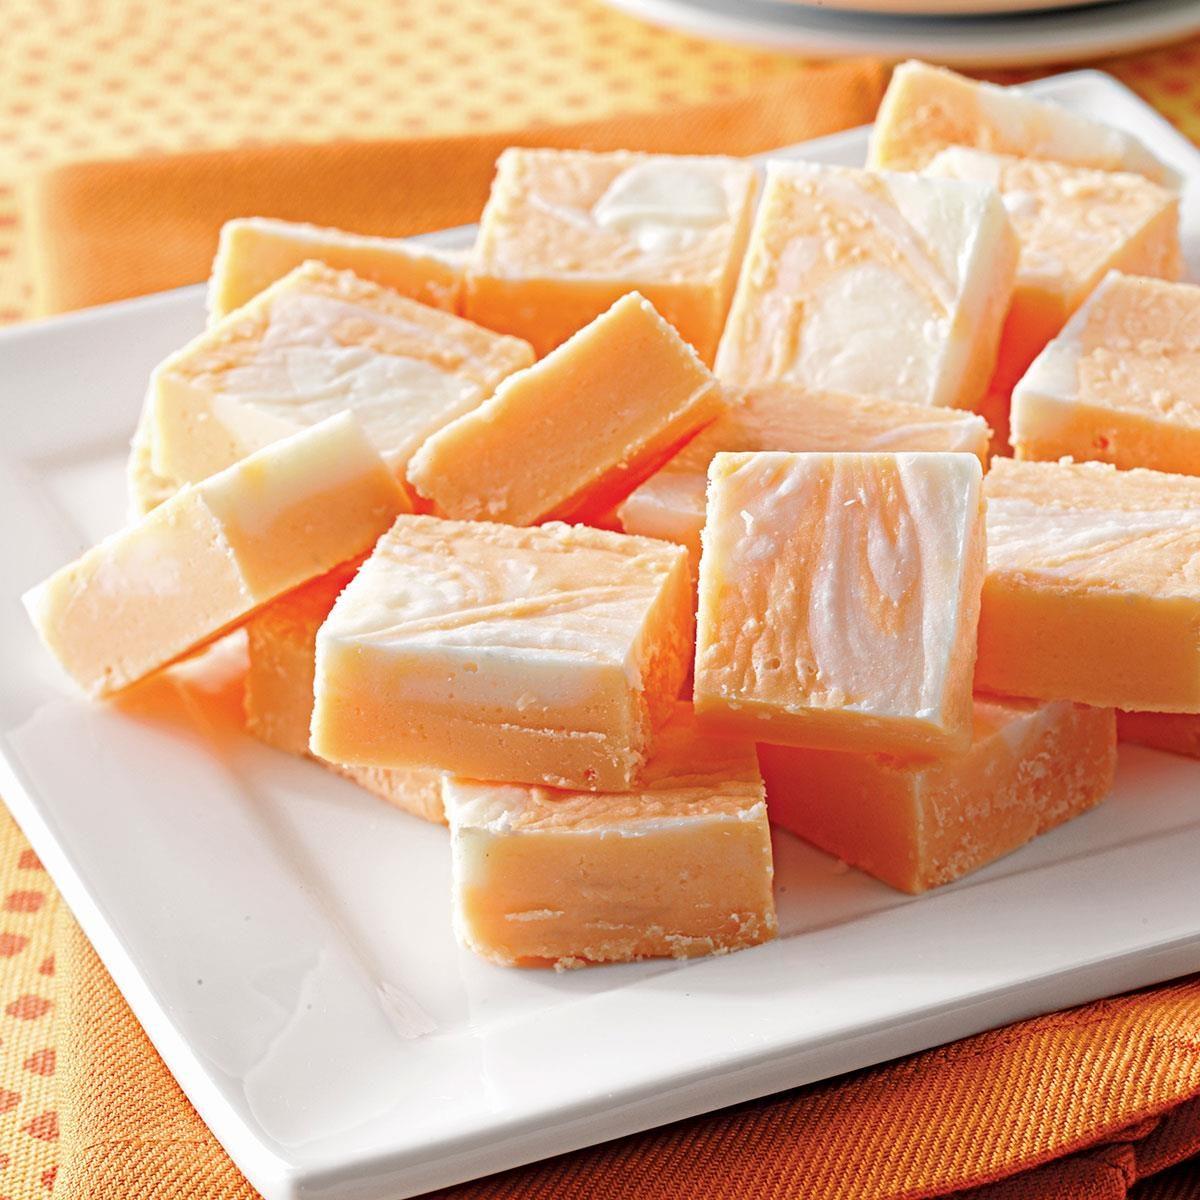 Chocolate Orange Peels Dunmore Candy Kitchen: Marbled Orange Fudge Recipe